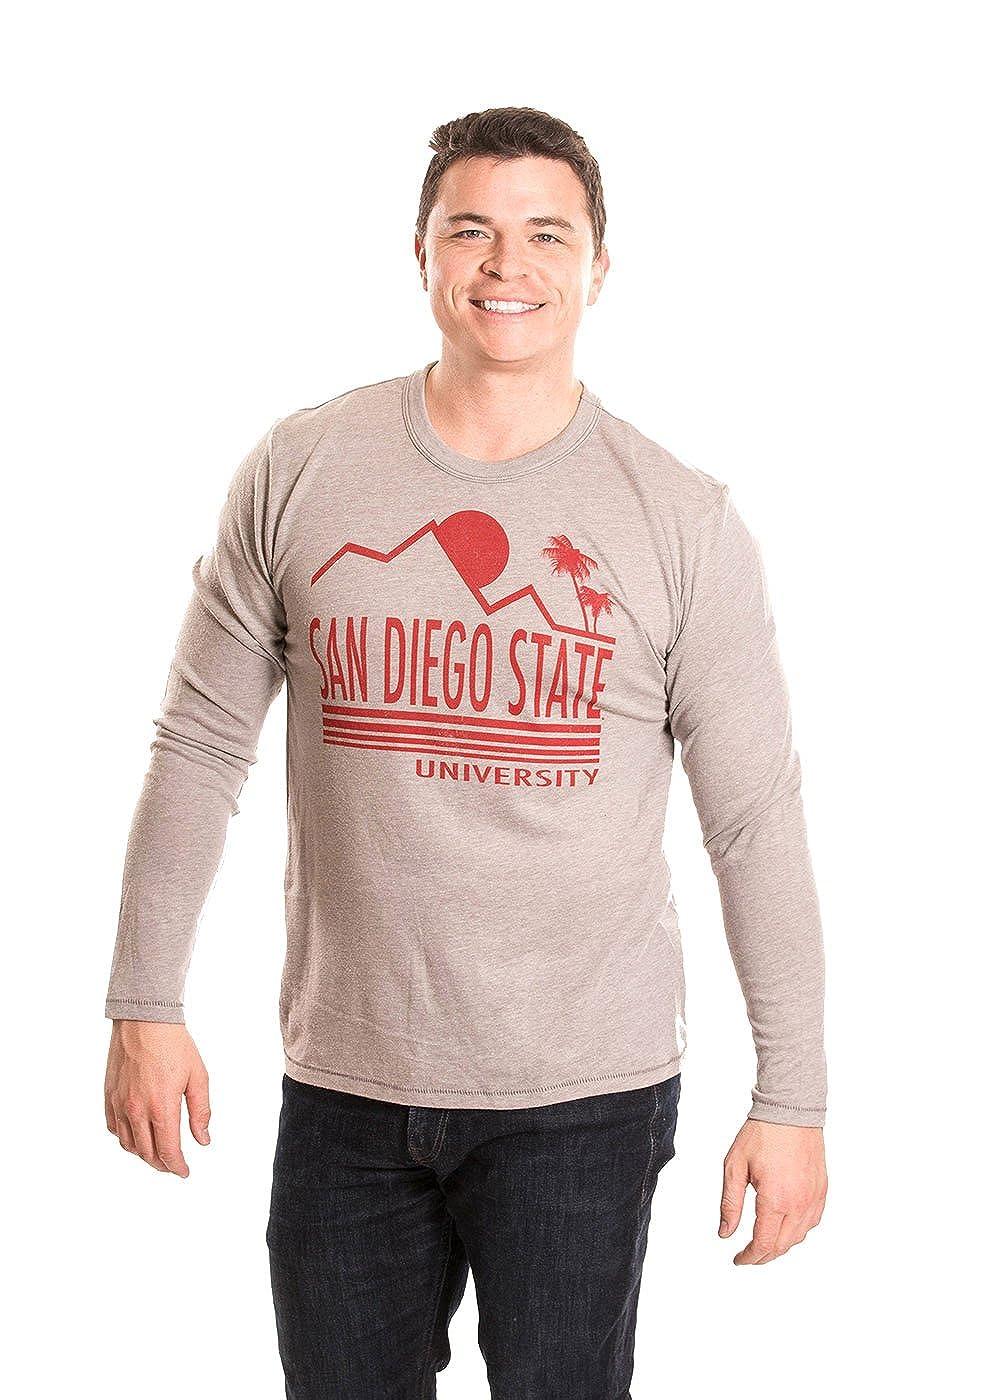 Medium Alma Mater NCAA Mens Long Sleeve T-Shirt San Diego State Aztecs